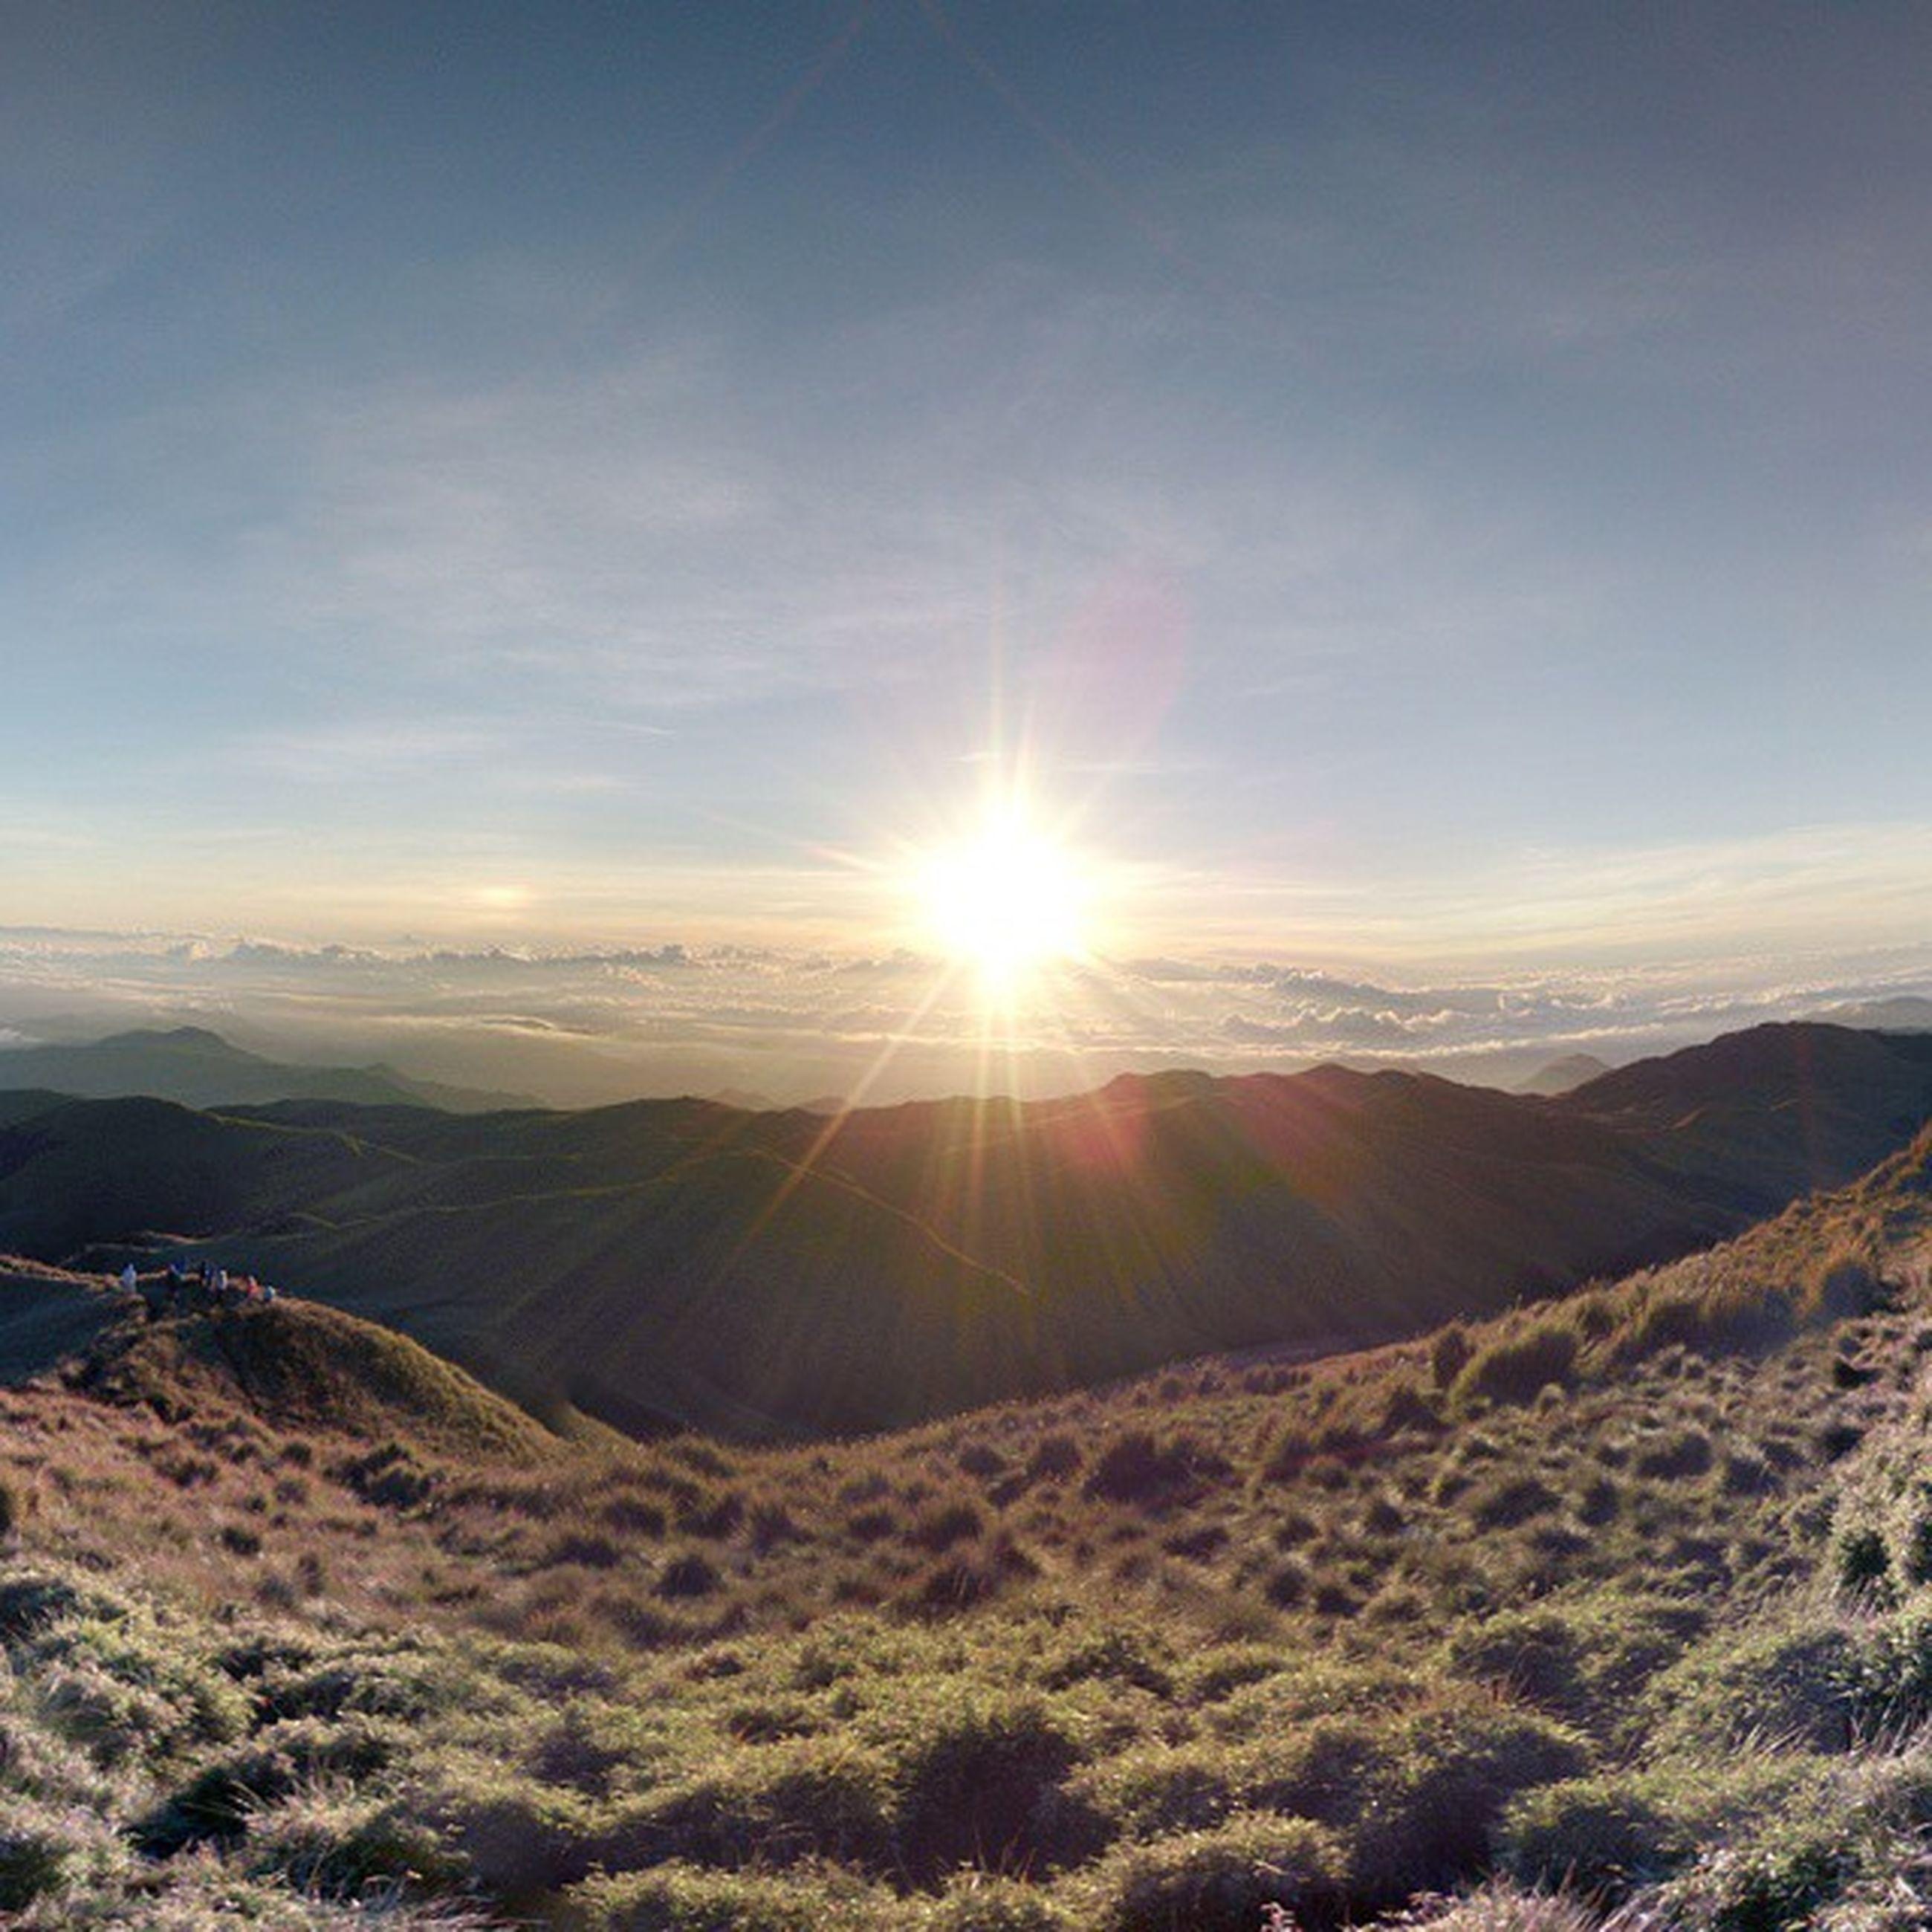 sun, landscape, mountain, tranquil scene, tranquility, scenics, sunbeam, sunlight, beauty in nature, mountain range, sky, nature, lens flare, non-urban scene, idyllic, remote, sunset, horizon over land, outdoors, travel destinations